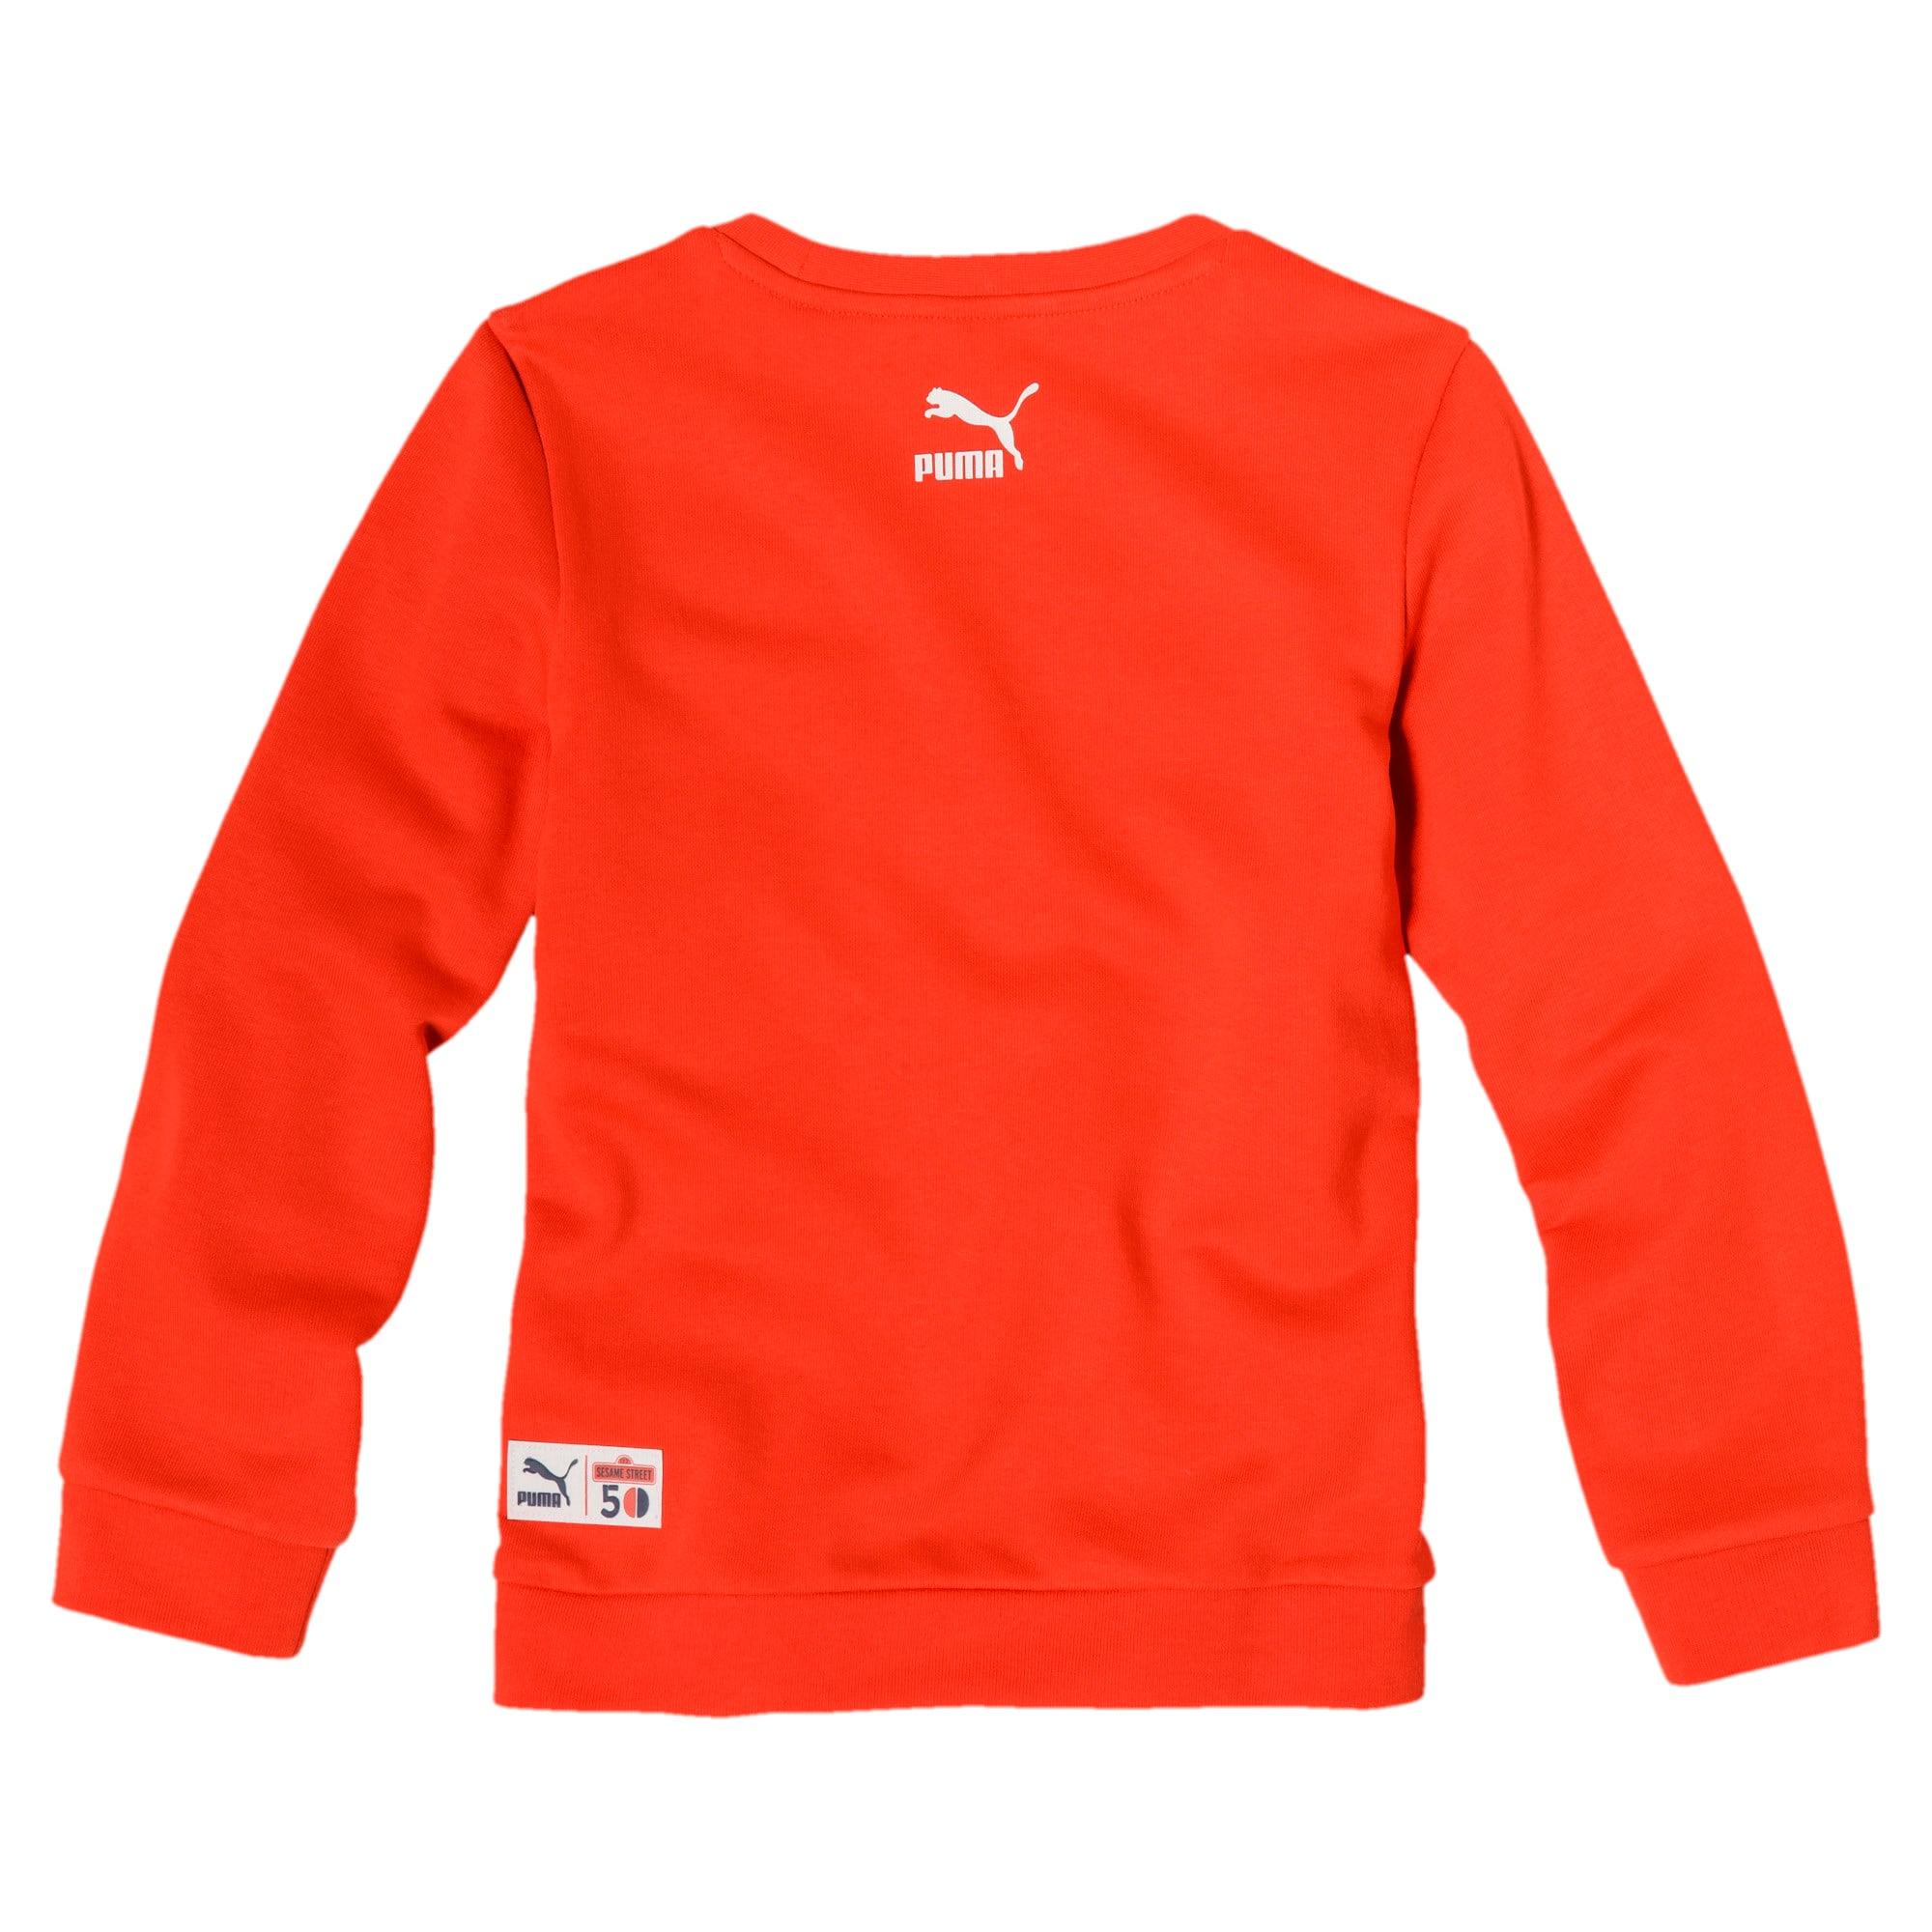 Miniatura 2 de Sudadera con cuello redondo PUMA x SESAME STREET para niño, Cherry Tomato, mediano